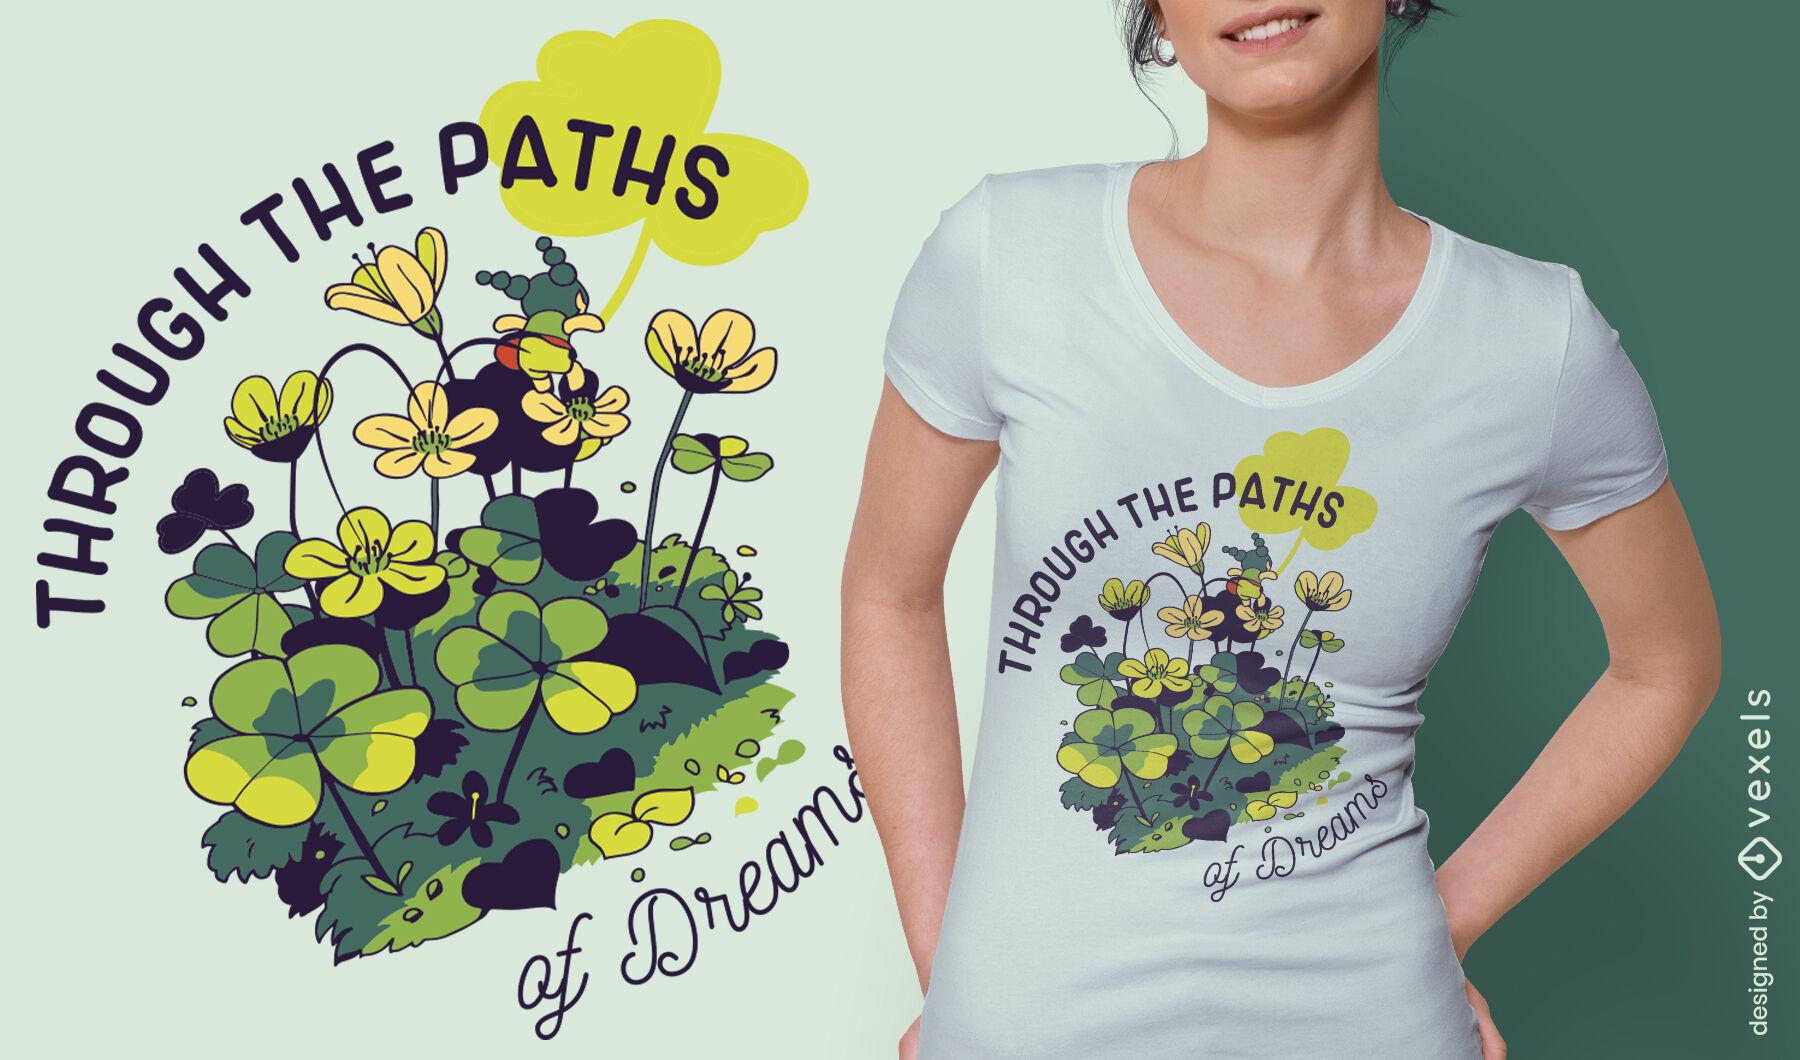 Pequeña niña en flores sueños cita diseño de camiseta